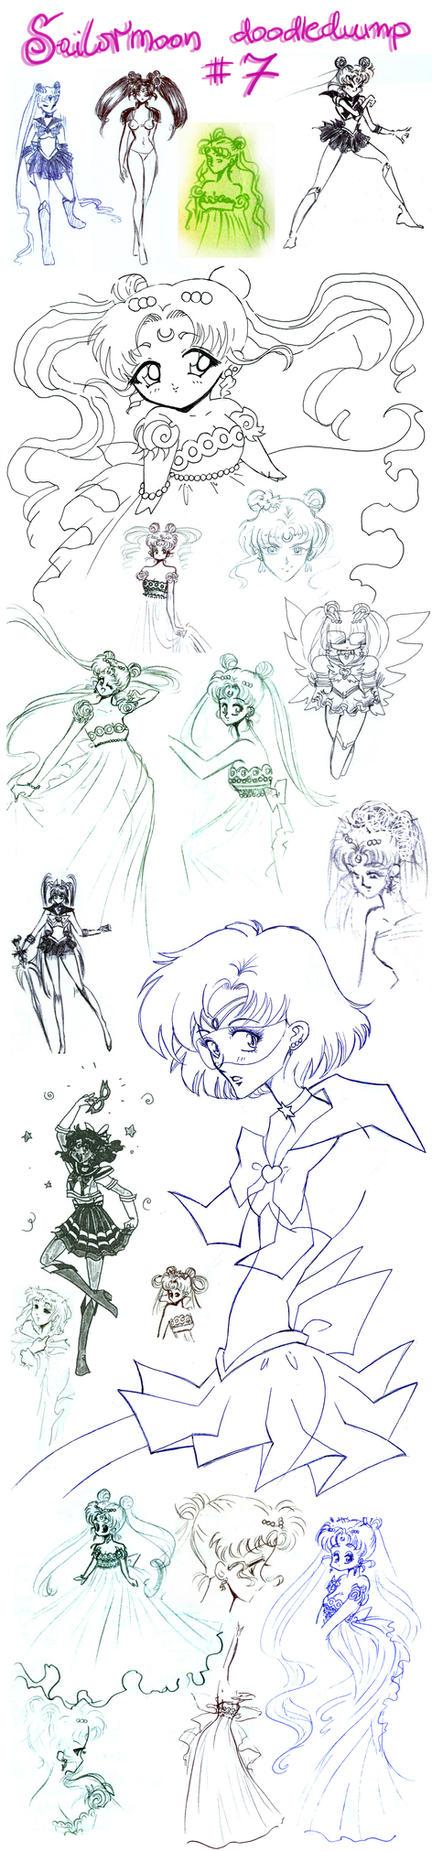 Sailormoon doodledump 7 by NitroFieja